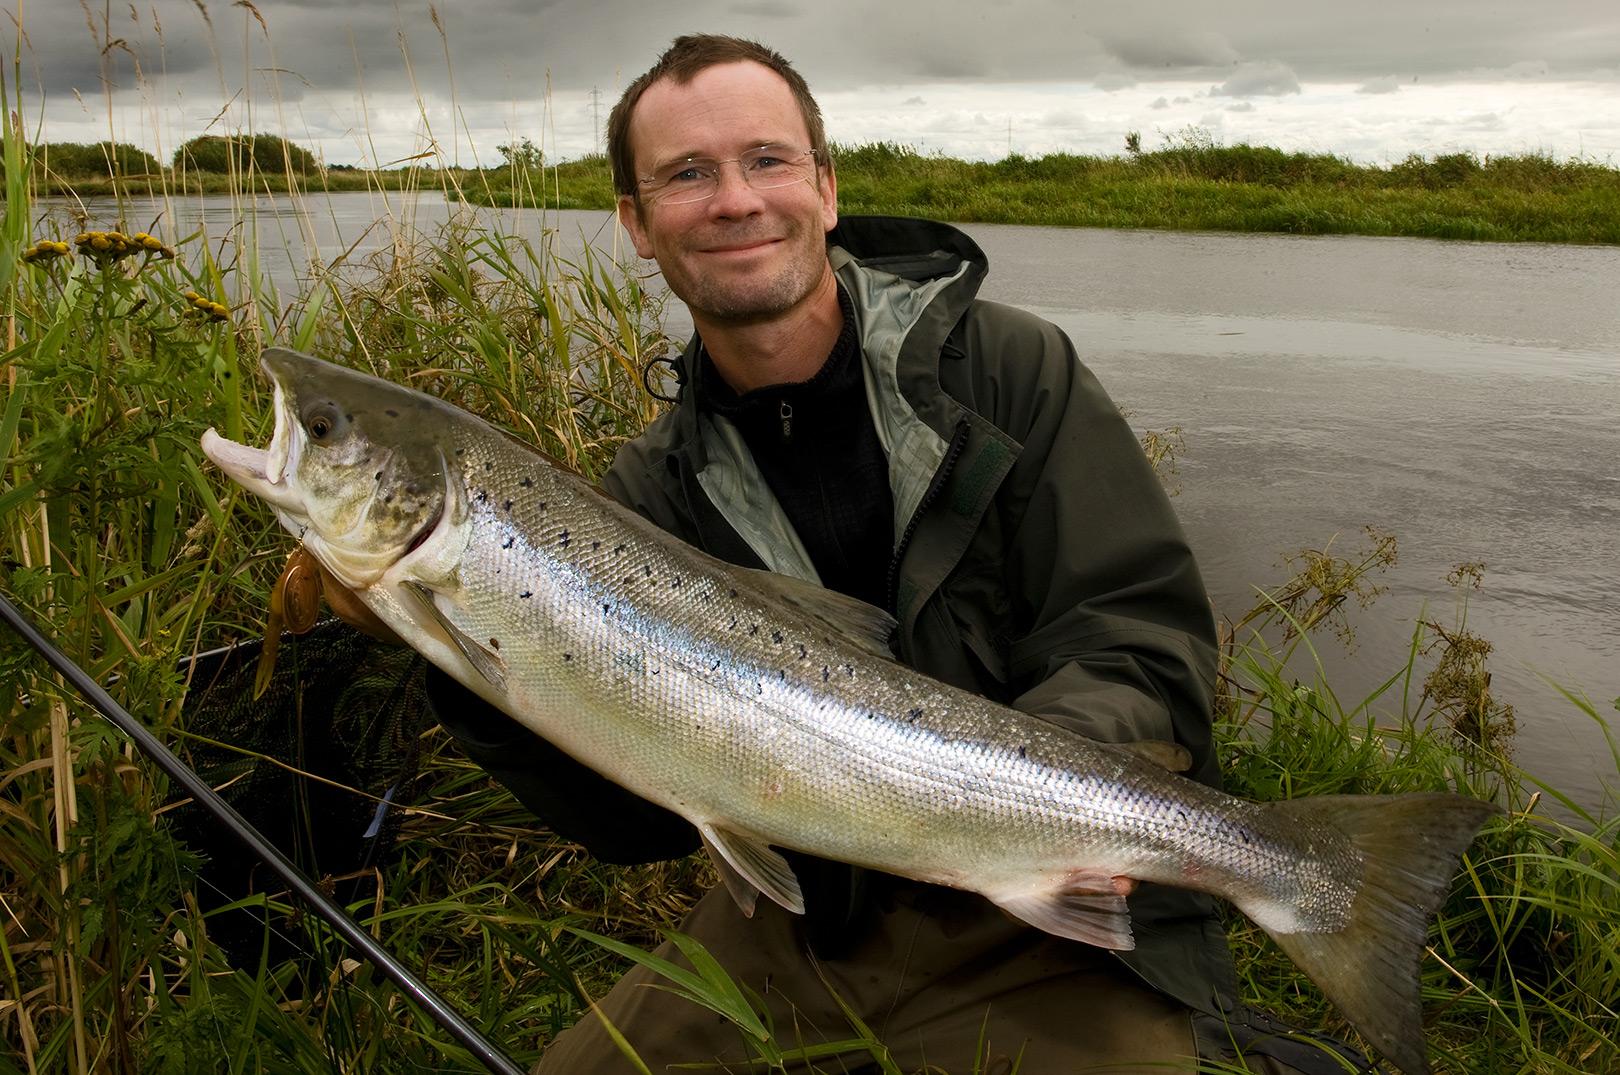 Jens Bursell med en fin laks taget på kondomspinner fisket med helikopter rig.